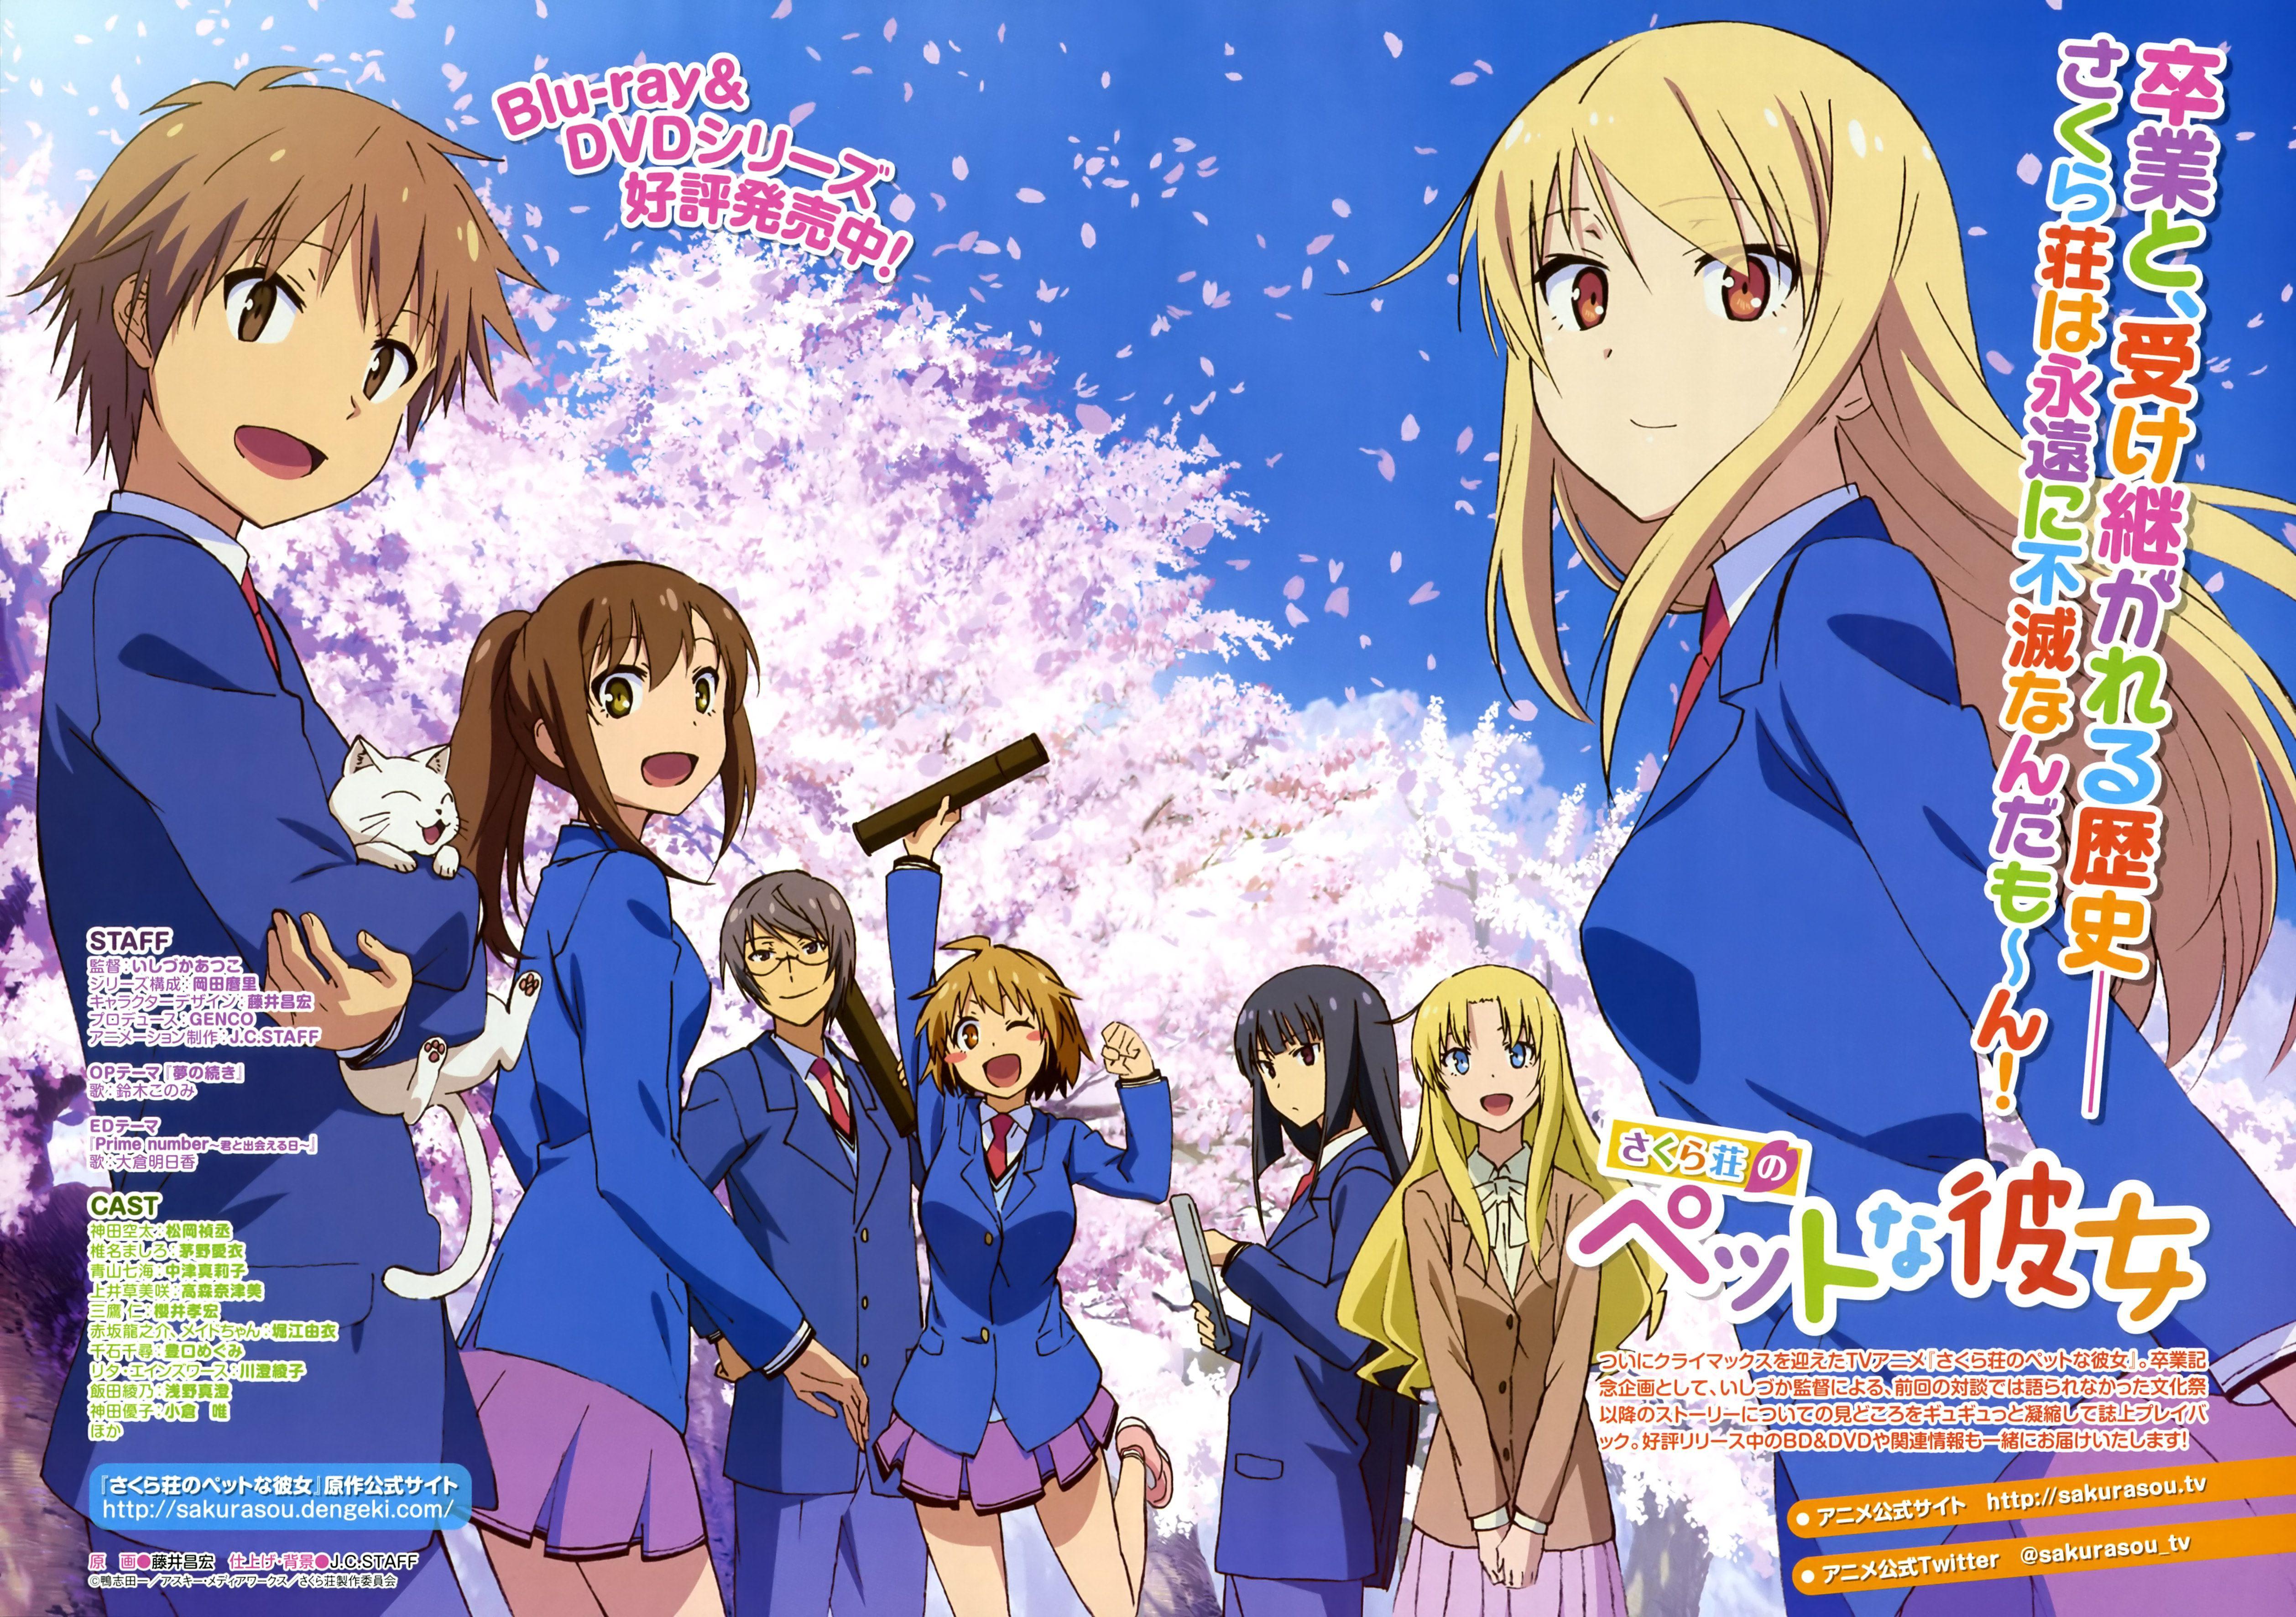 Sakurasou Wallpaper Google Search Anime Otaku Anime Manga Anime